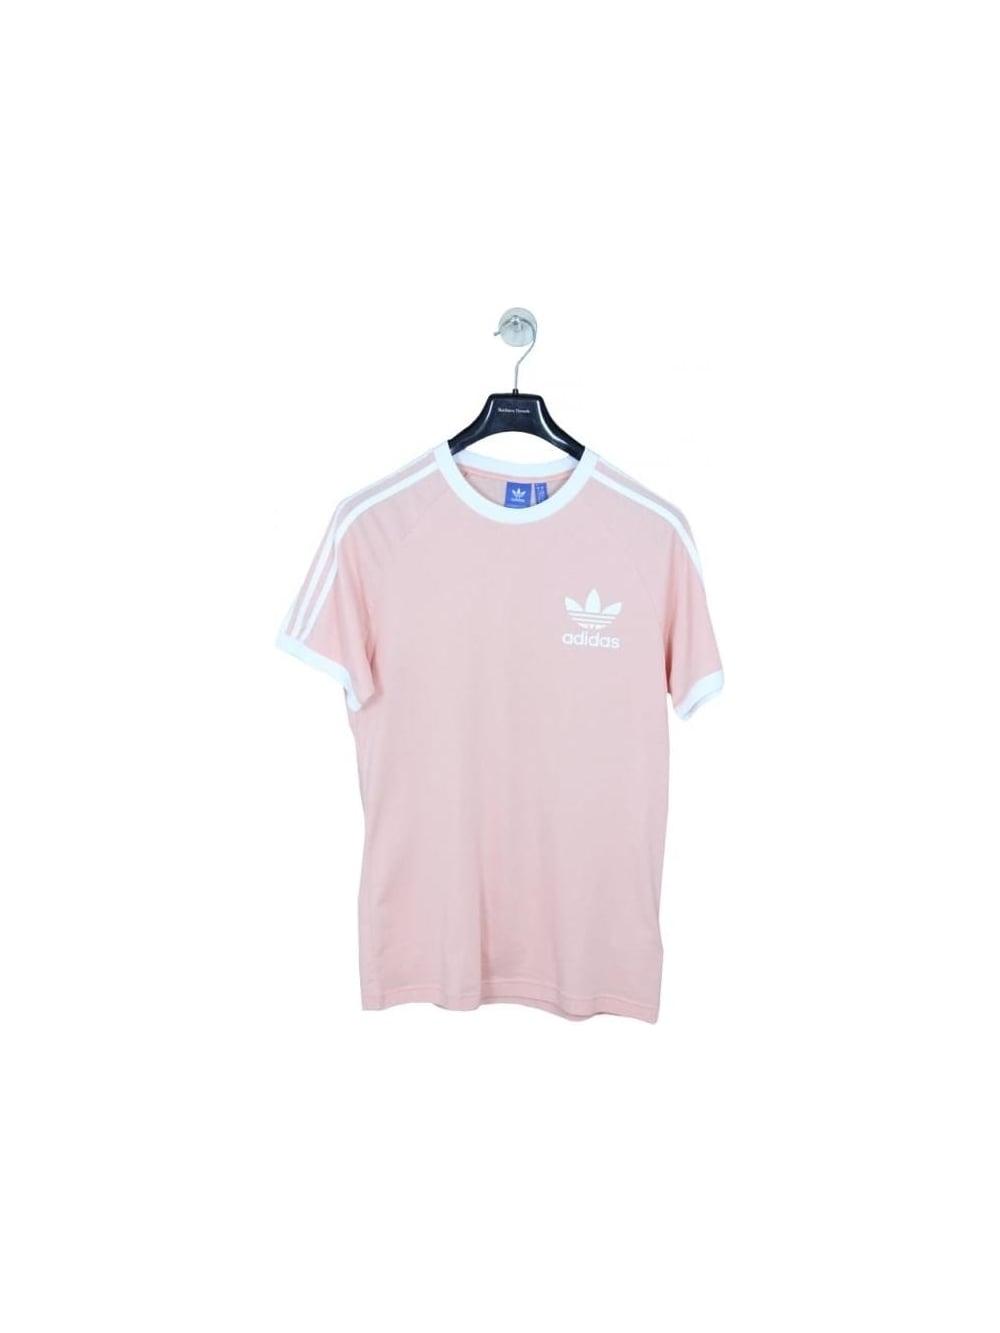 adidas originals california t shirt pink